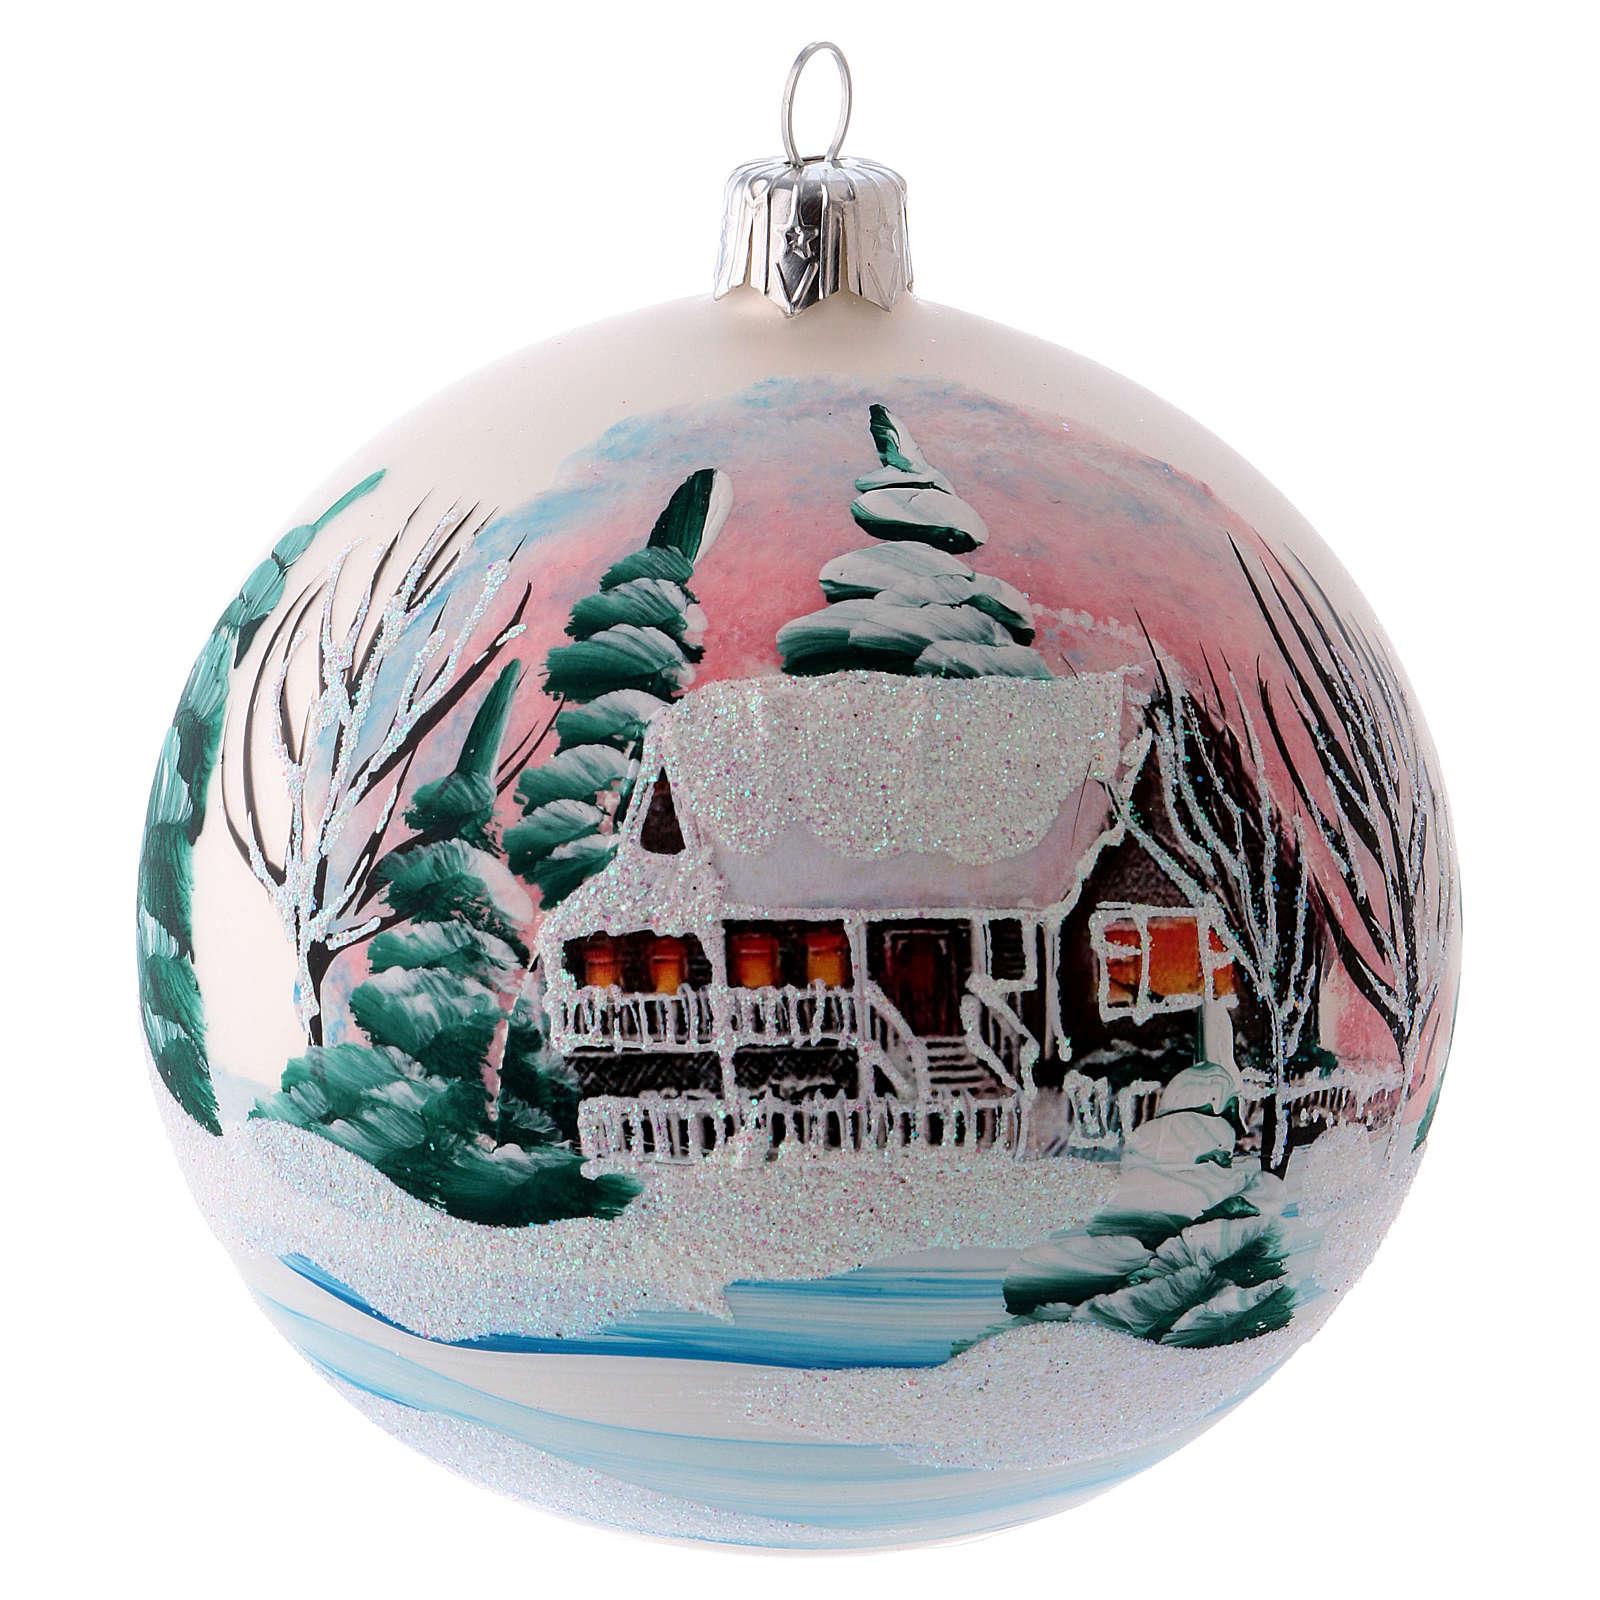 Bola árvore Natal opaca vidro soprado 100 mm aldeia de inverno nevada 4